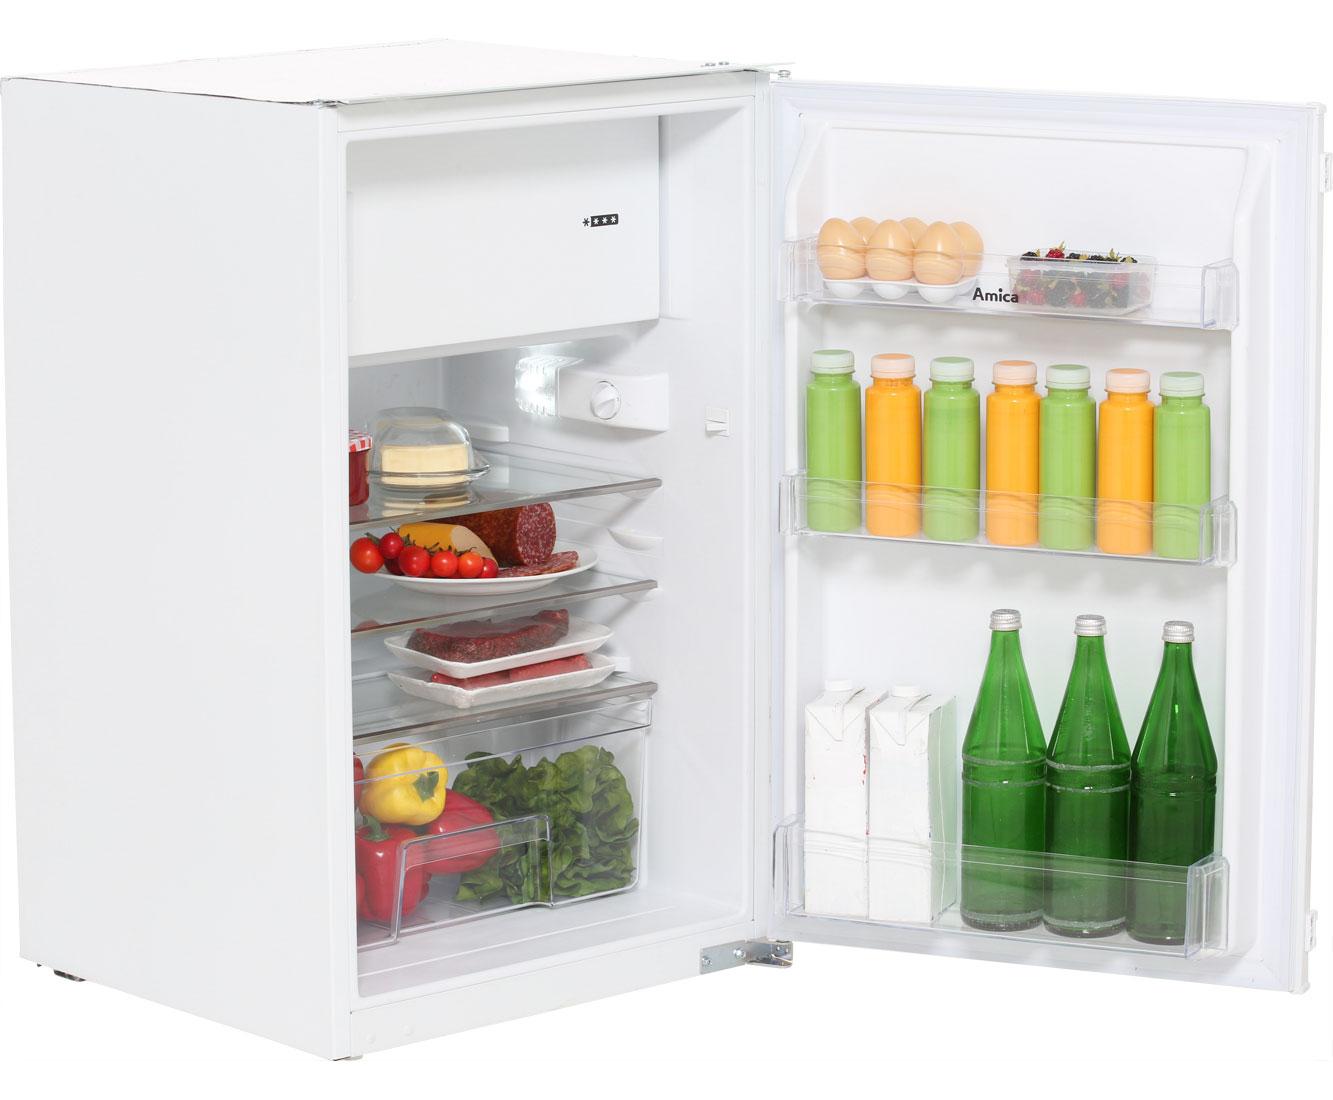 Amica Kühlschrank Ks 15123 W : Kühlschrank mit eisfach gorenje rb 4092 anw kühlschrank mit